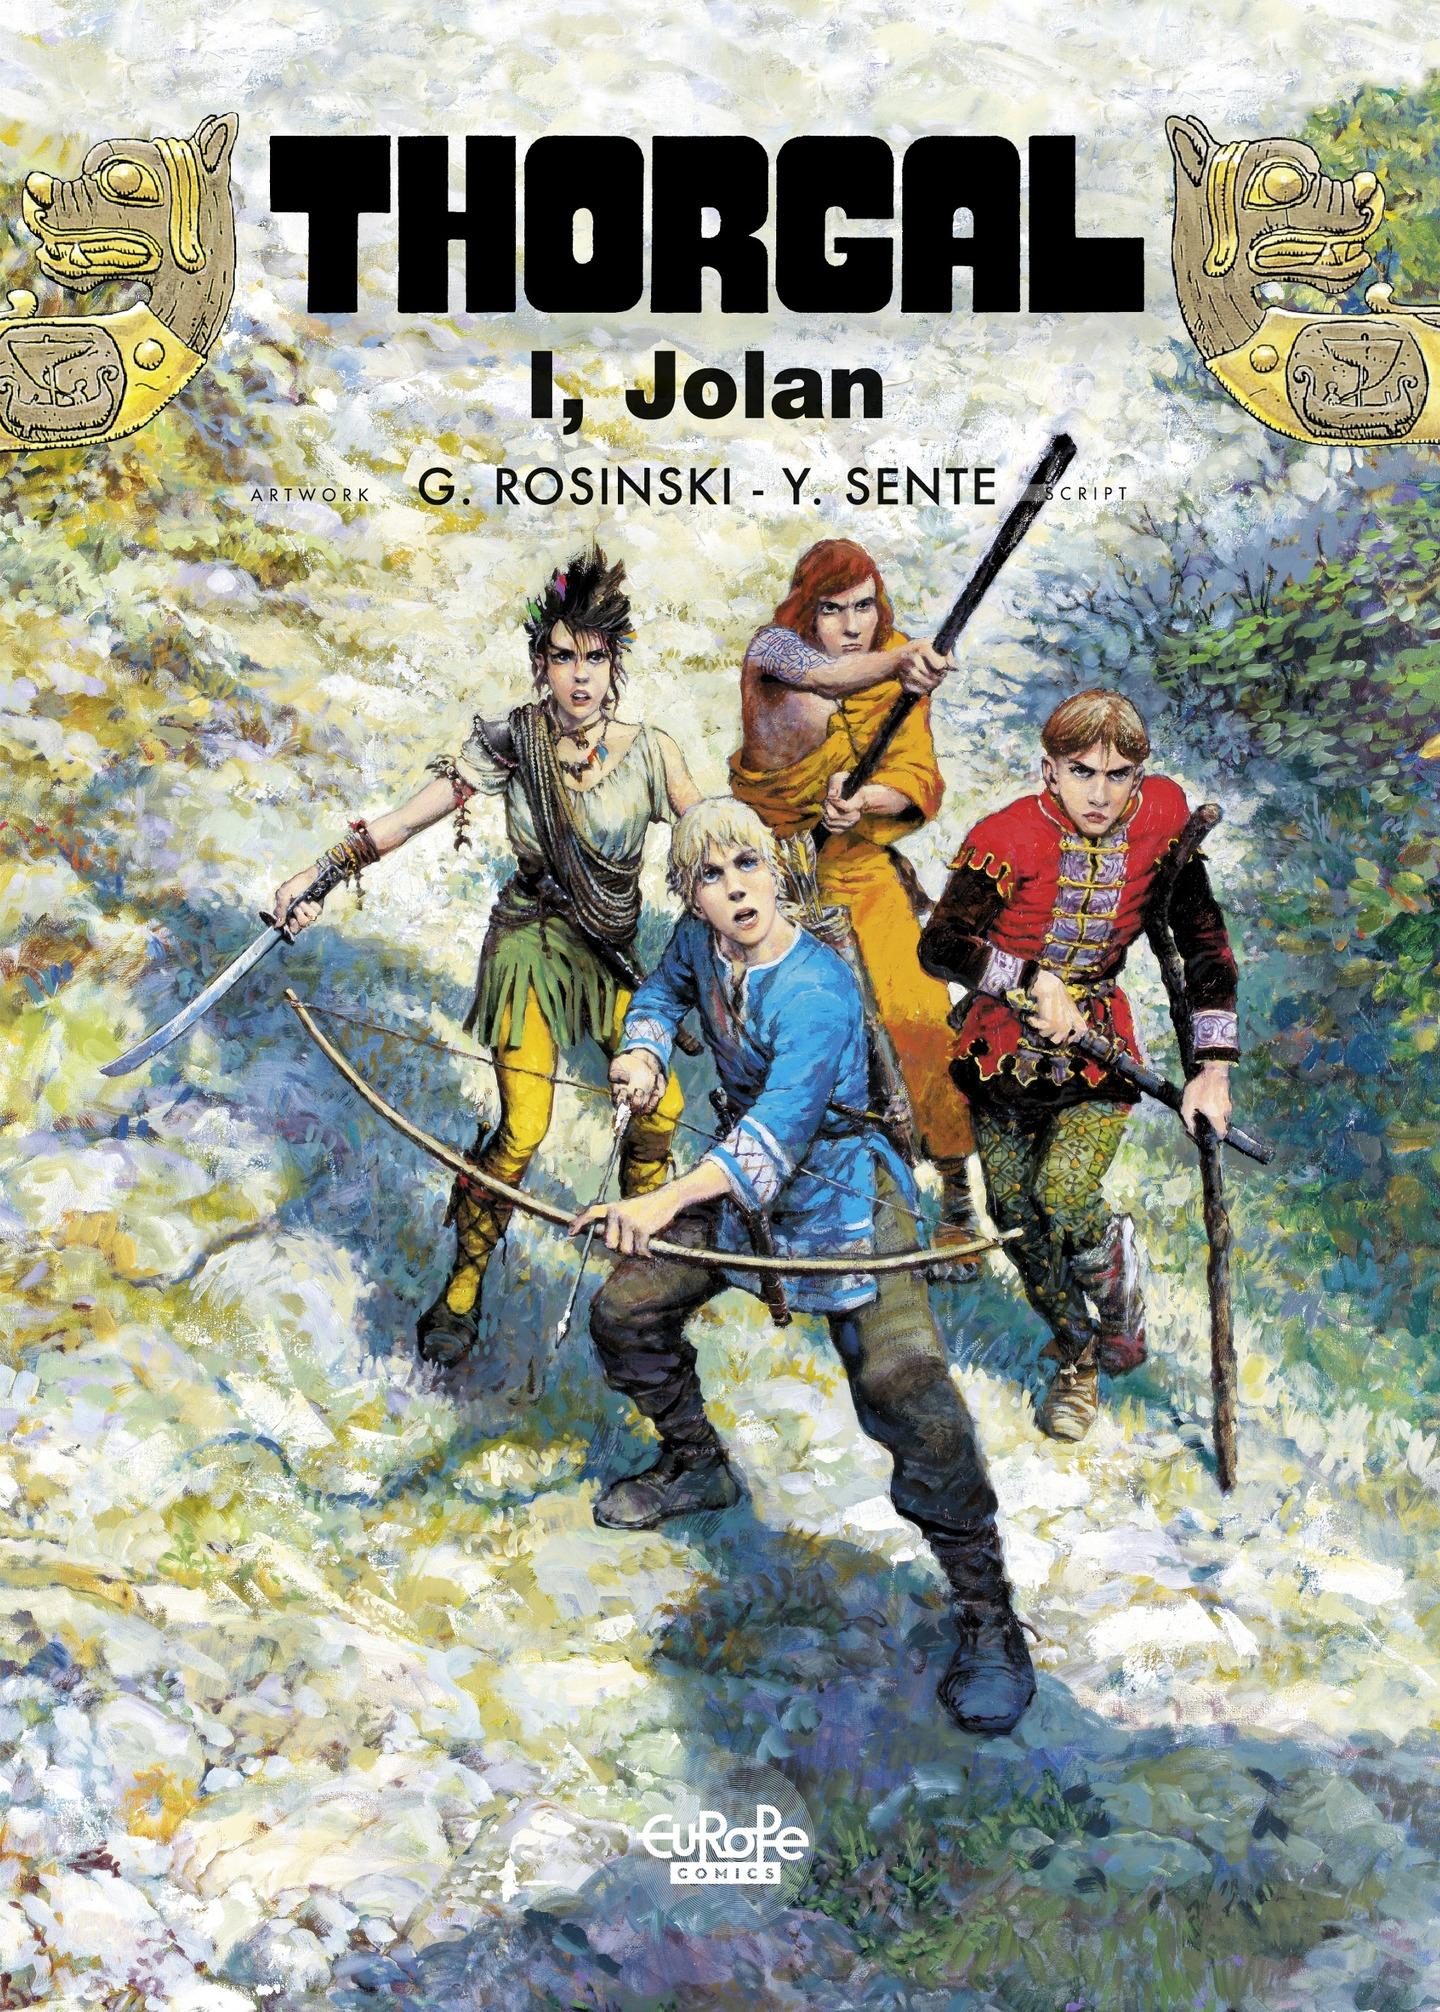 Thorgal - I, Jolan